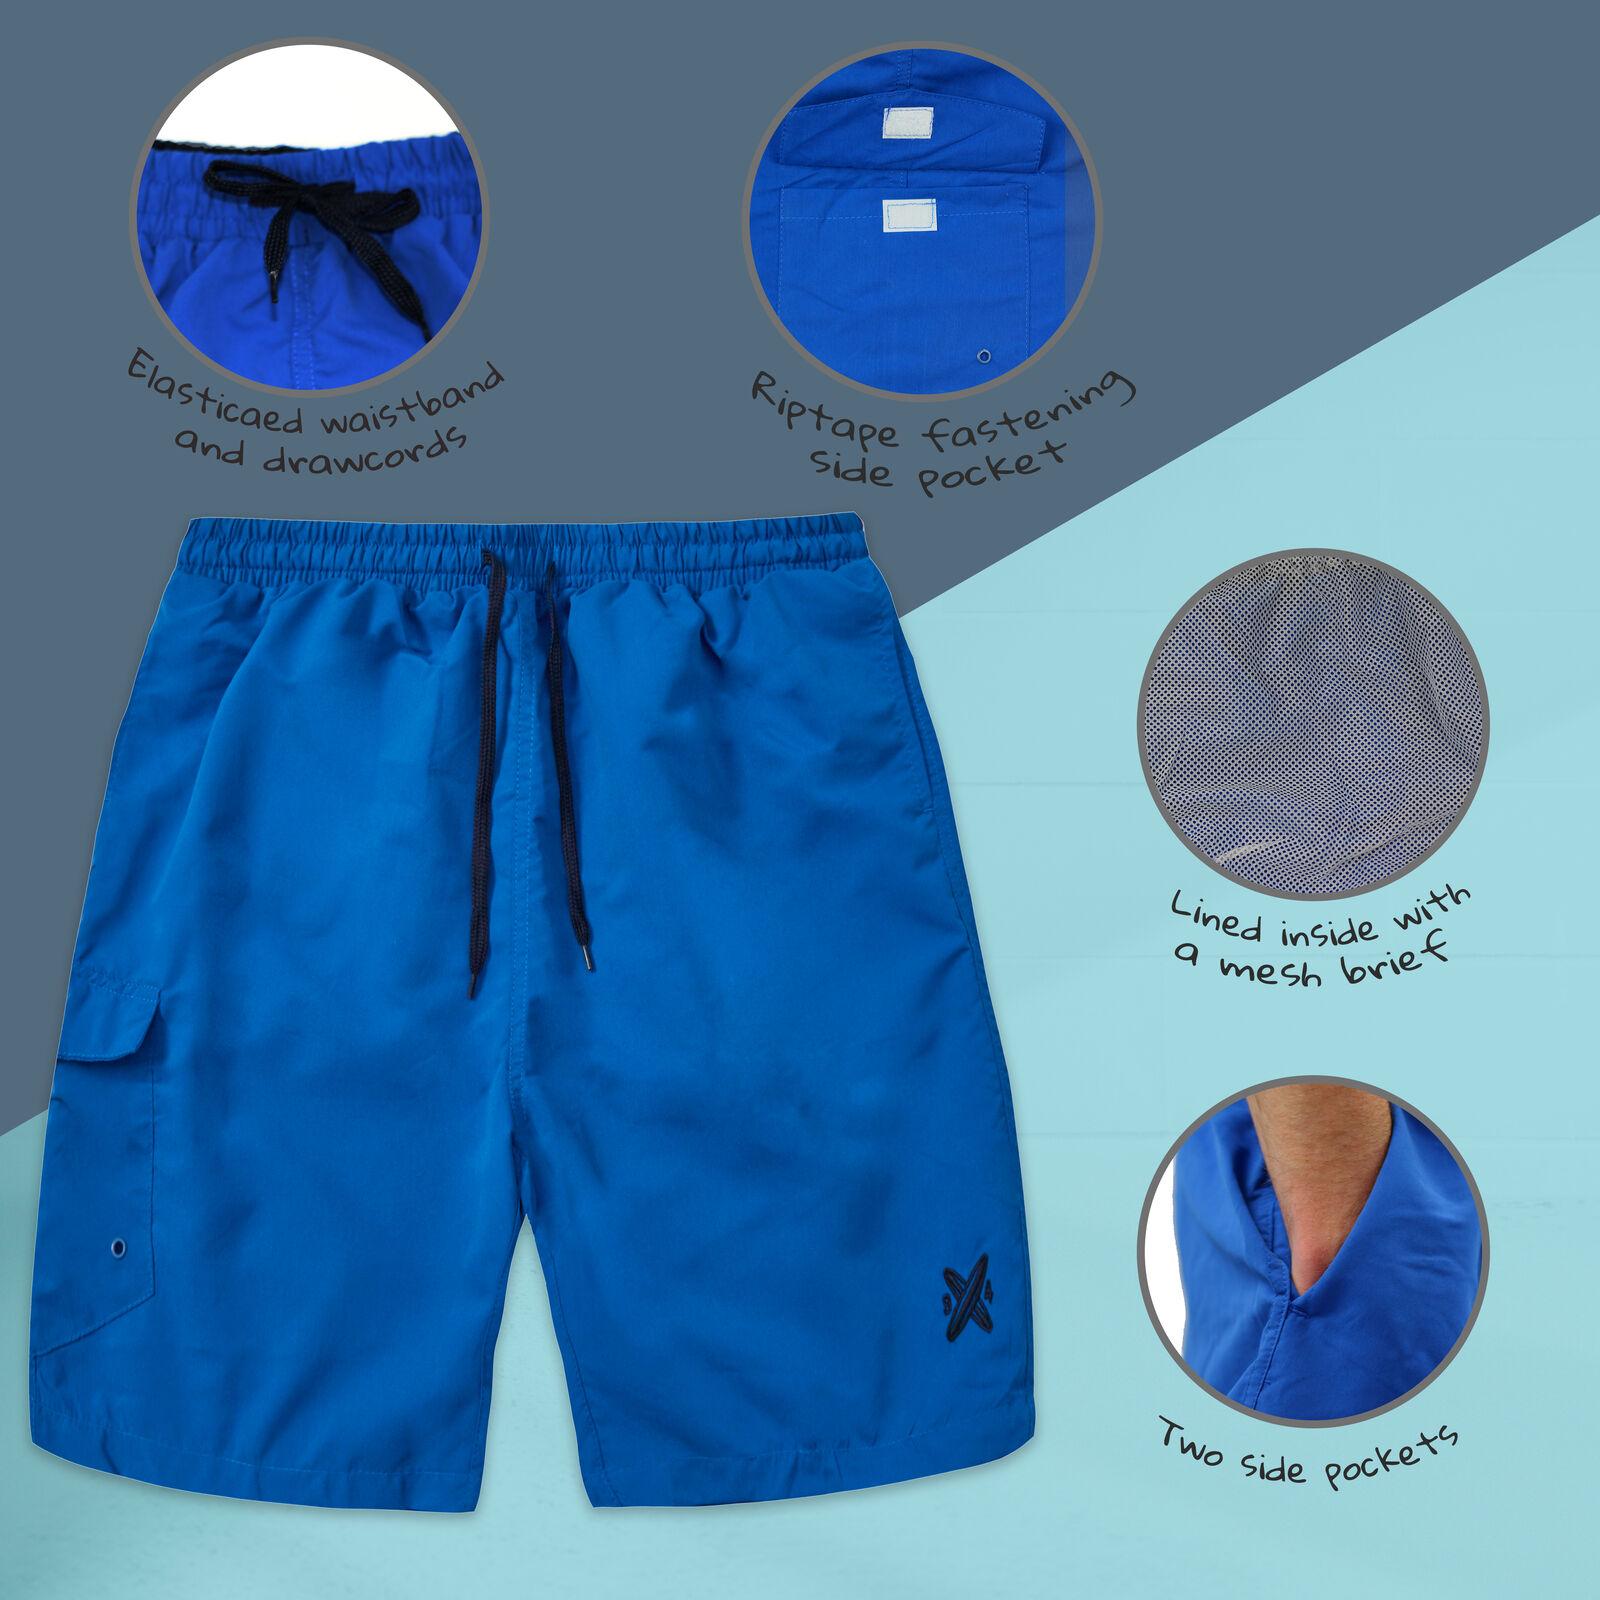 Da Uomo 3 Pack Quick Dry Swim Wear Pantaloncini BAULI tasche SURF BOARD TAGLIE FORTI